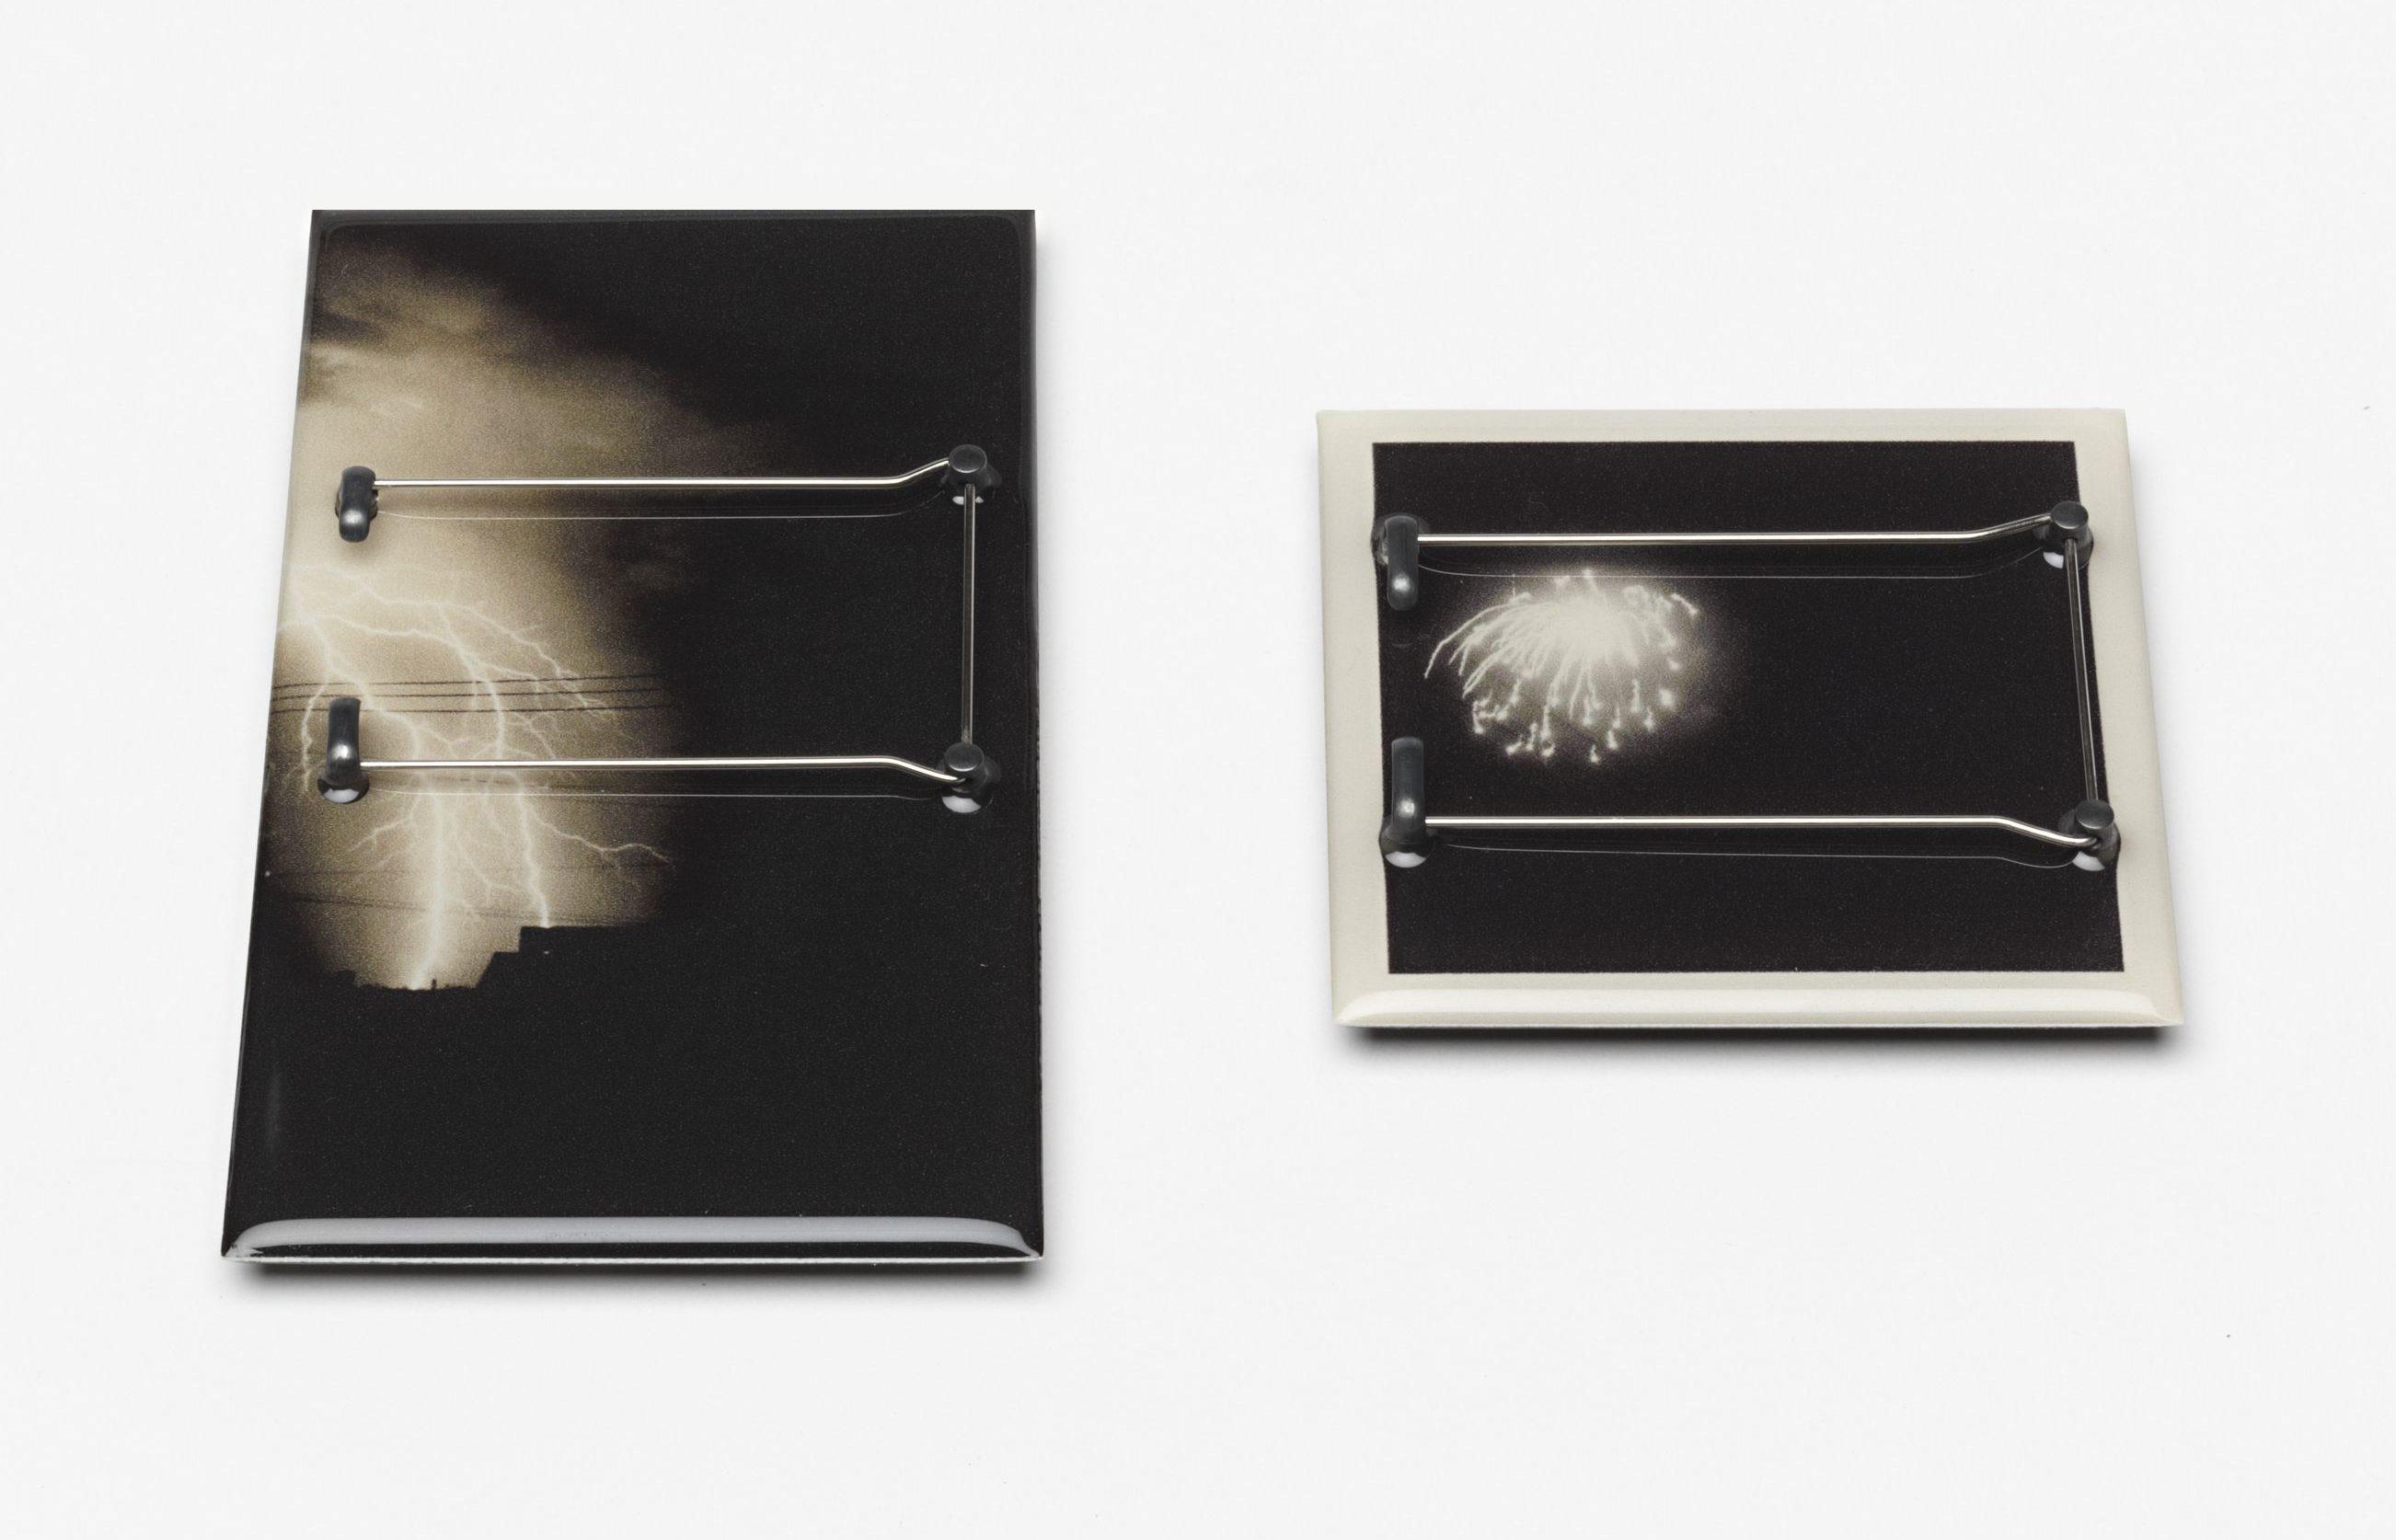 Kiko Gianocca, Never been there, broches, 2012, achterzijde. Von Hier und Dort, 2015, zilver, hars, lak